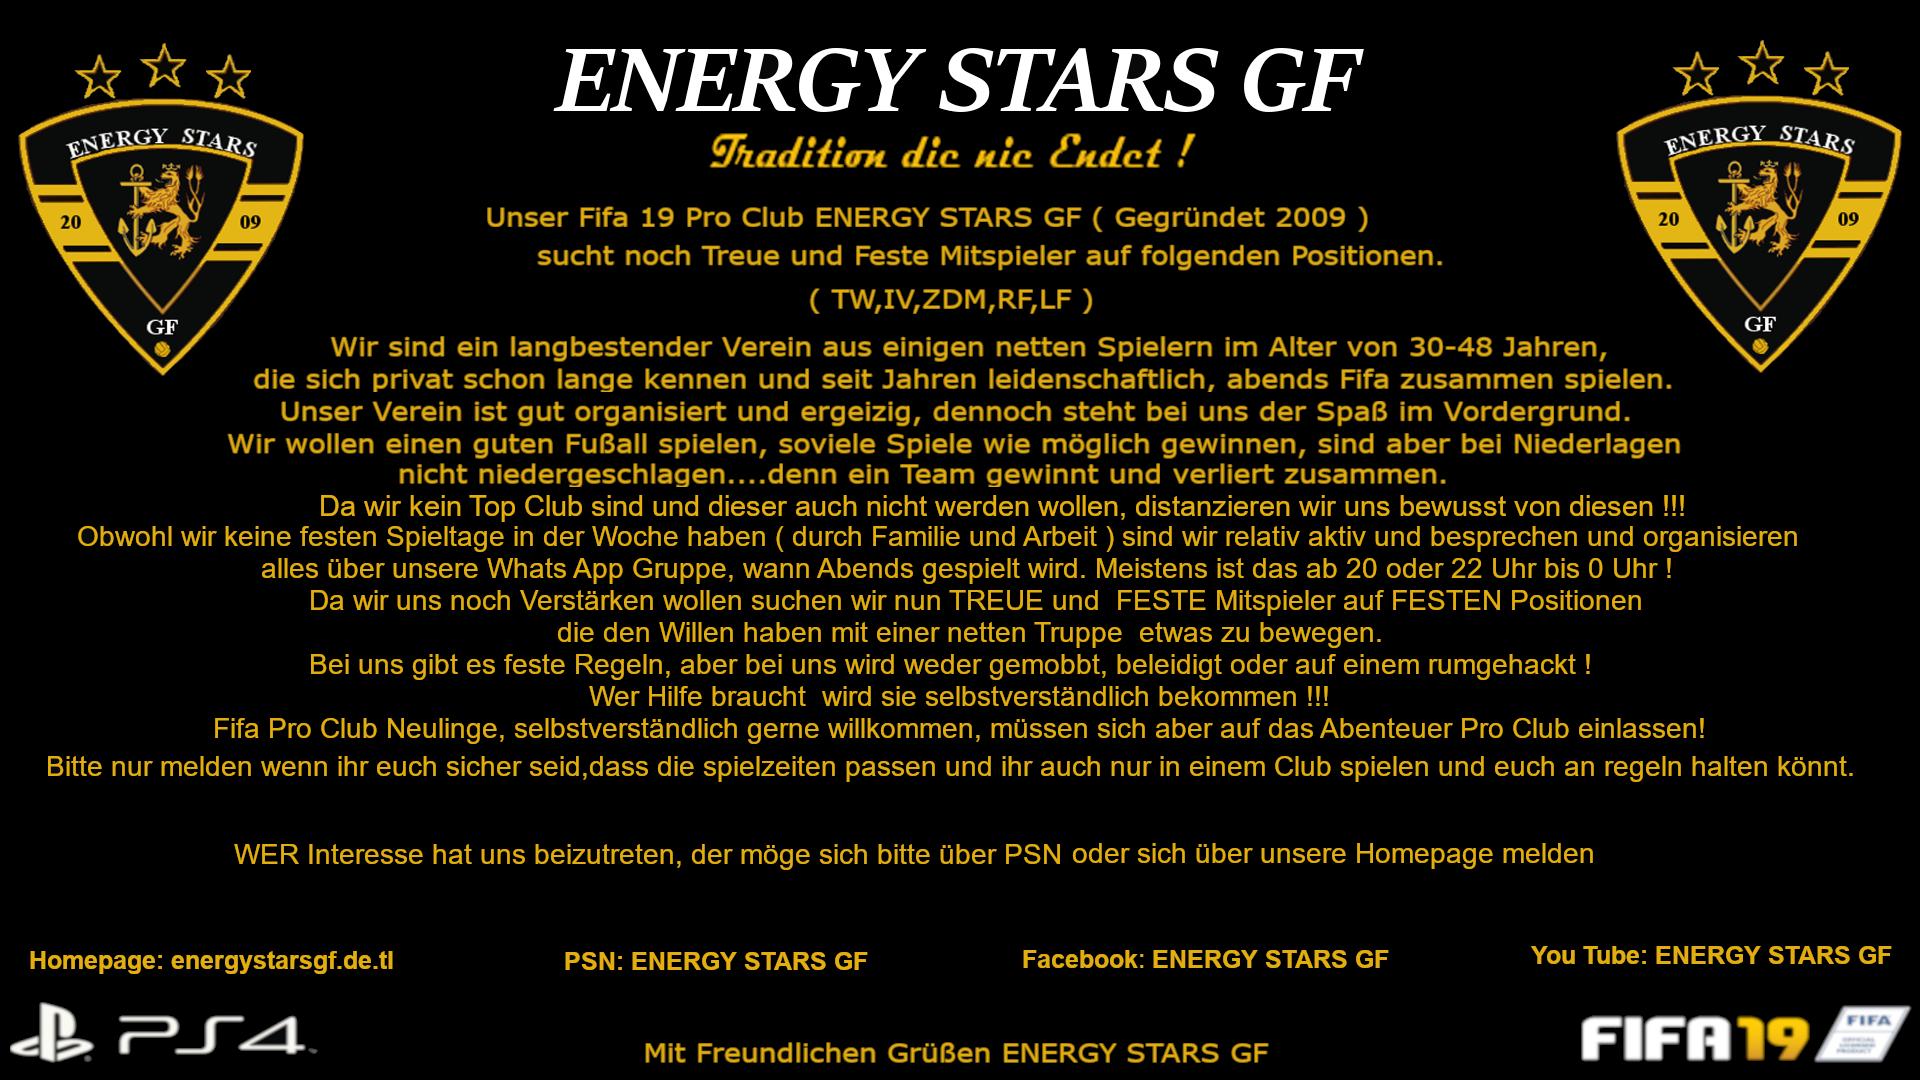 ENERGY%20STARS%20GF%20FIFA19%20SPIELERSU